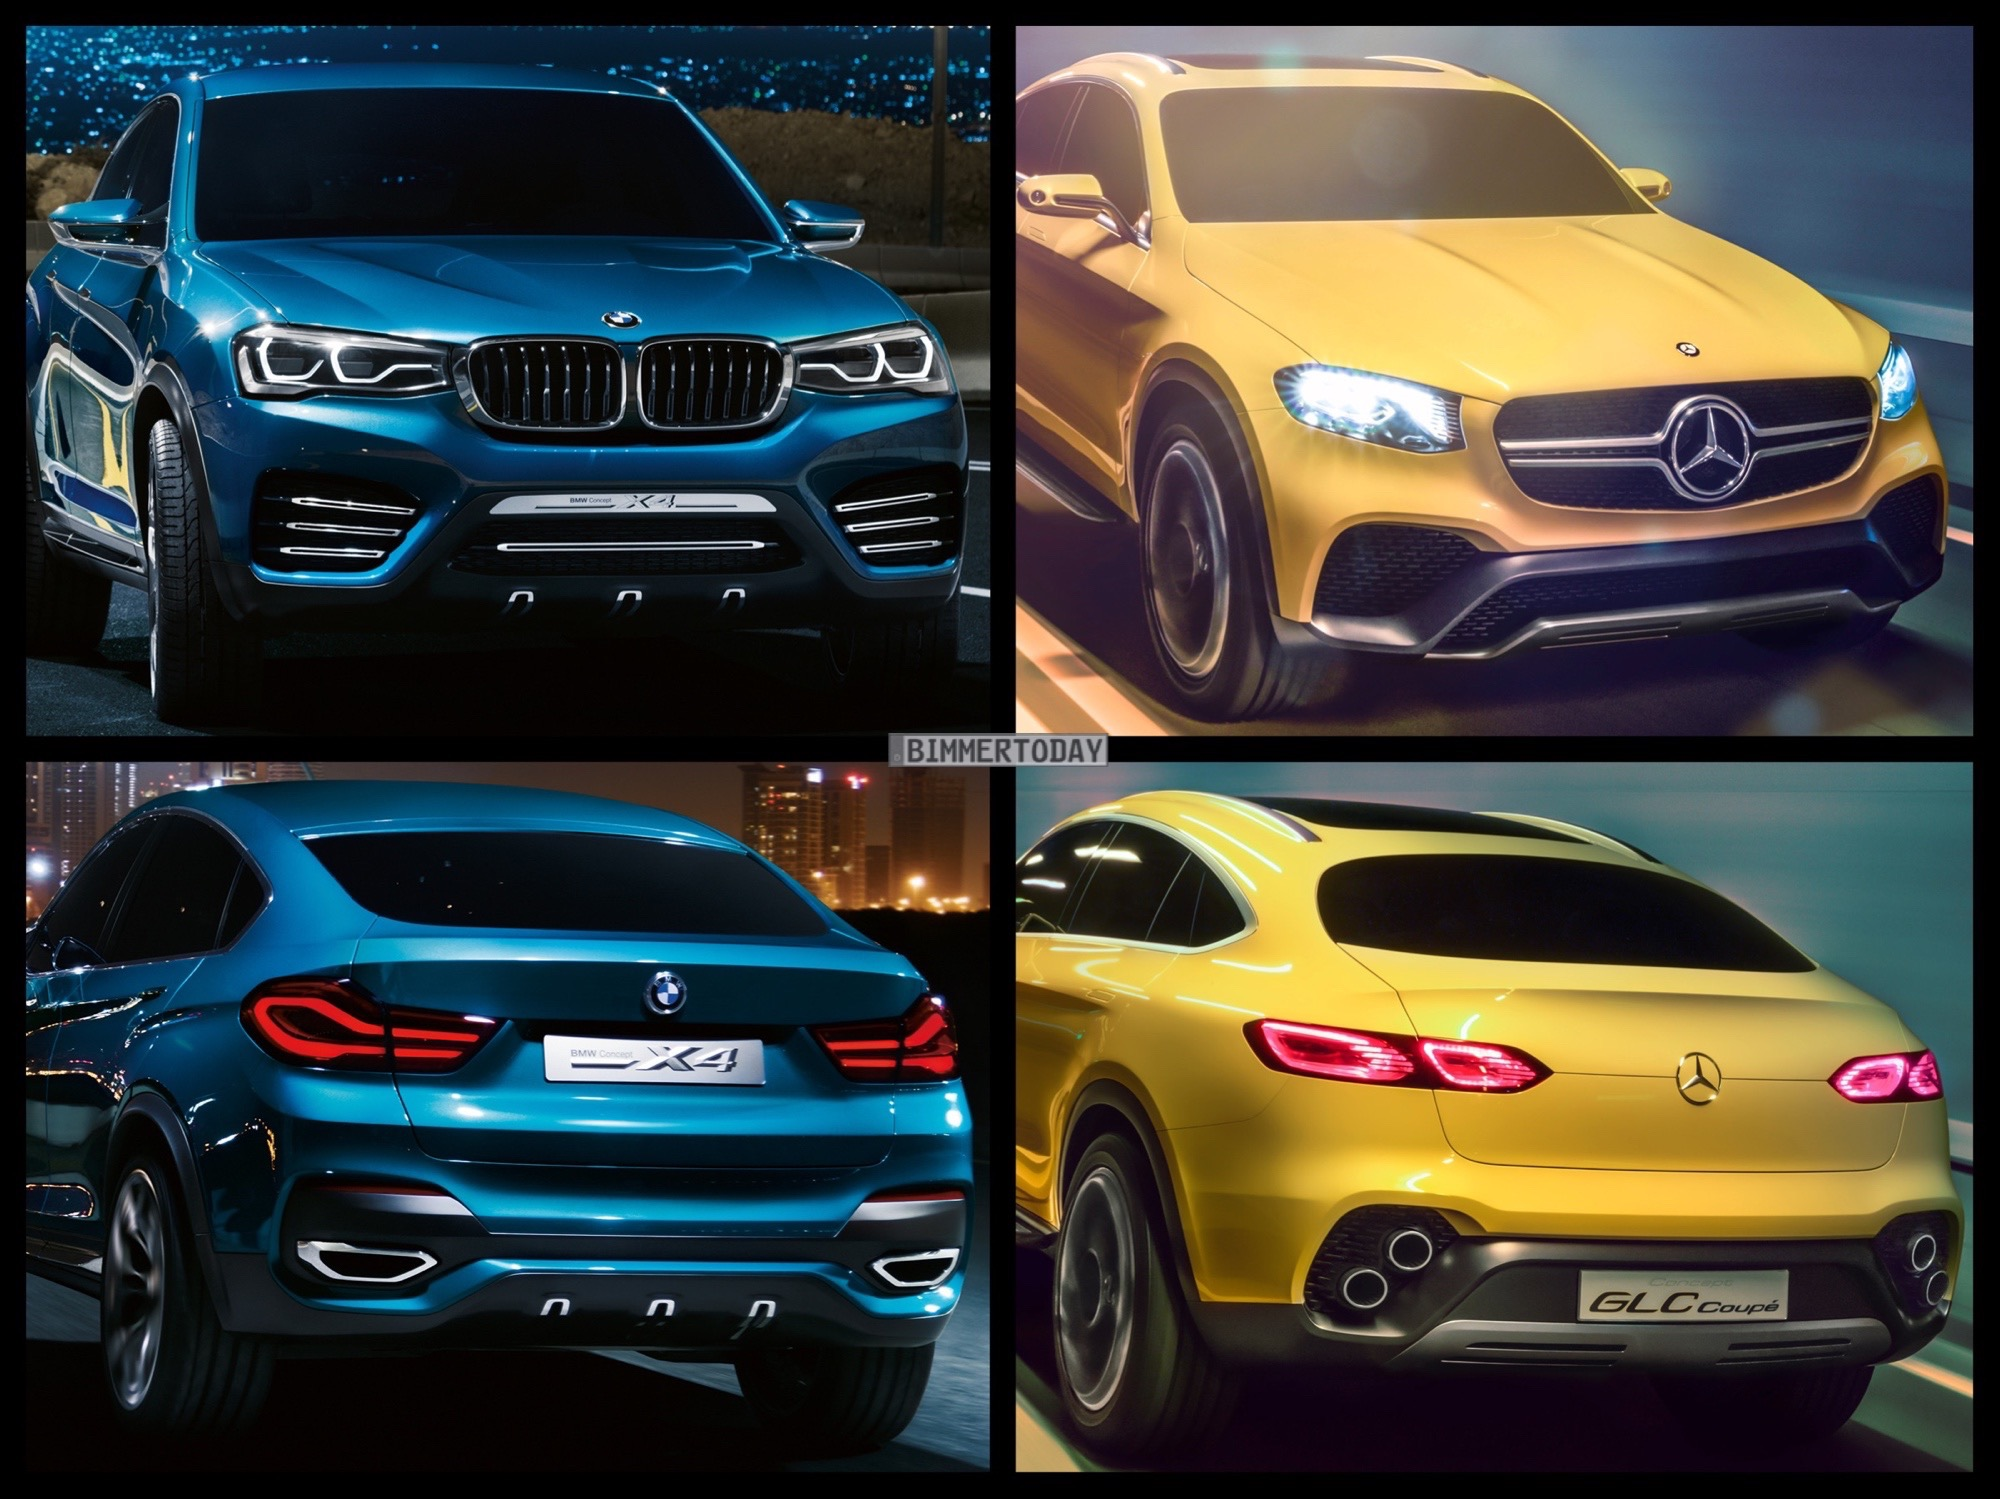 Bild-Vergleich: Mercedes GLC Coupé vs. BMW X4